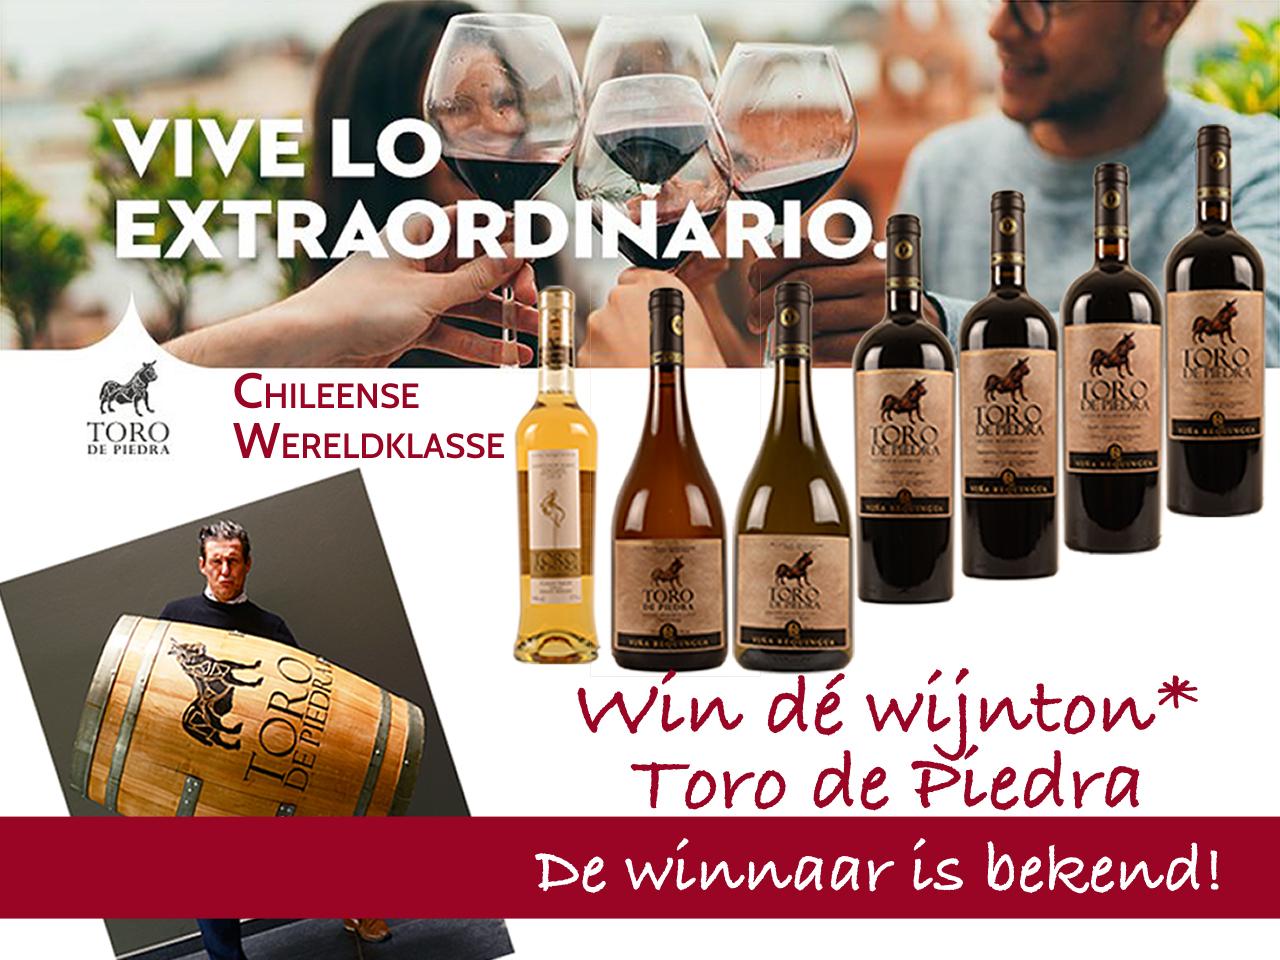 Toro de piedra promo 5+1 gratis winnaar wijnton